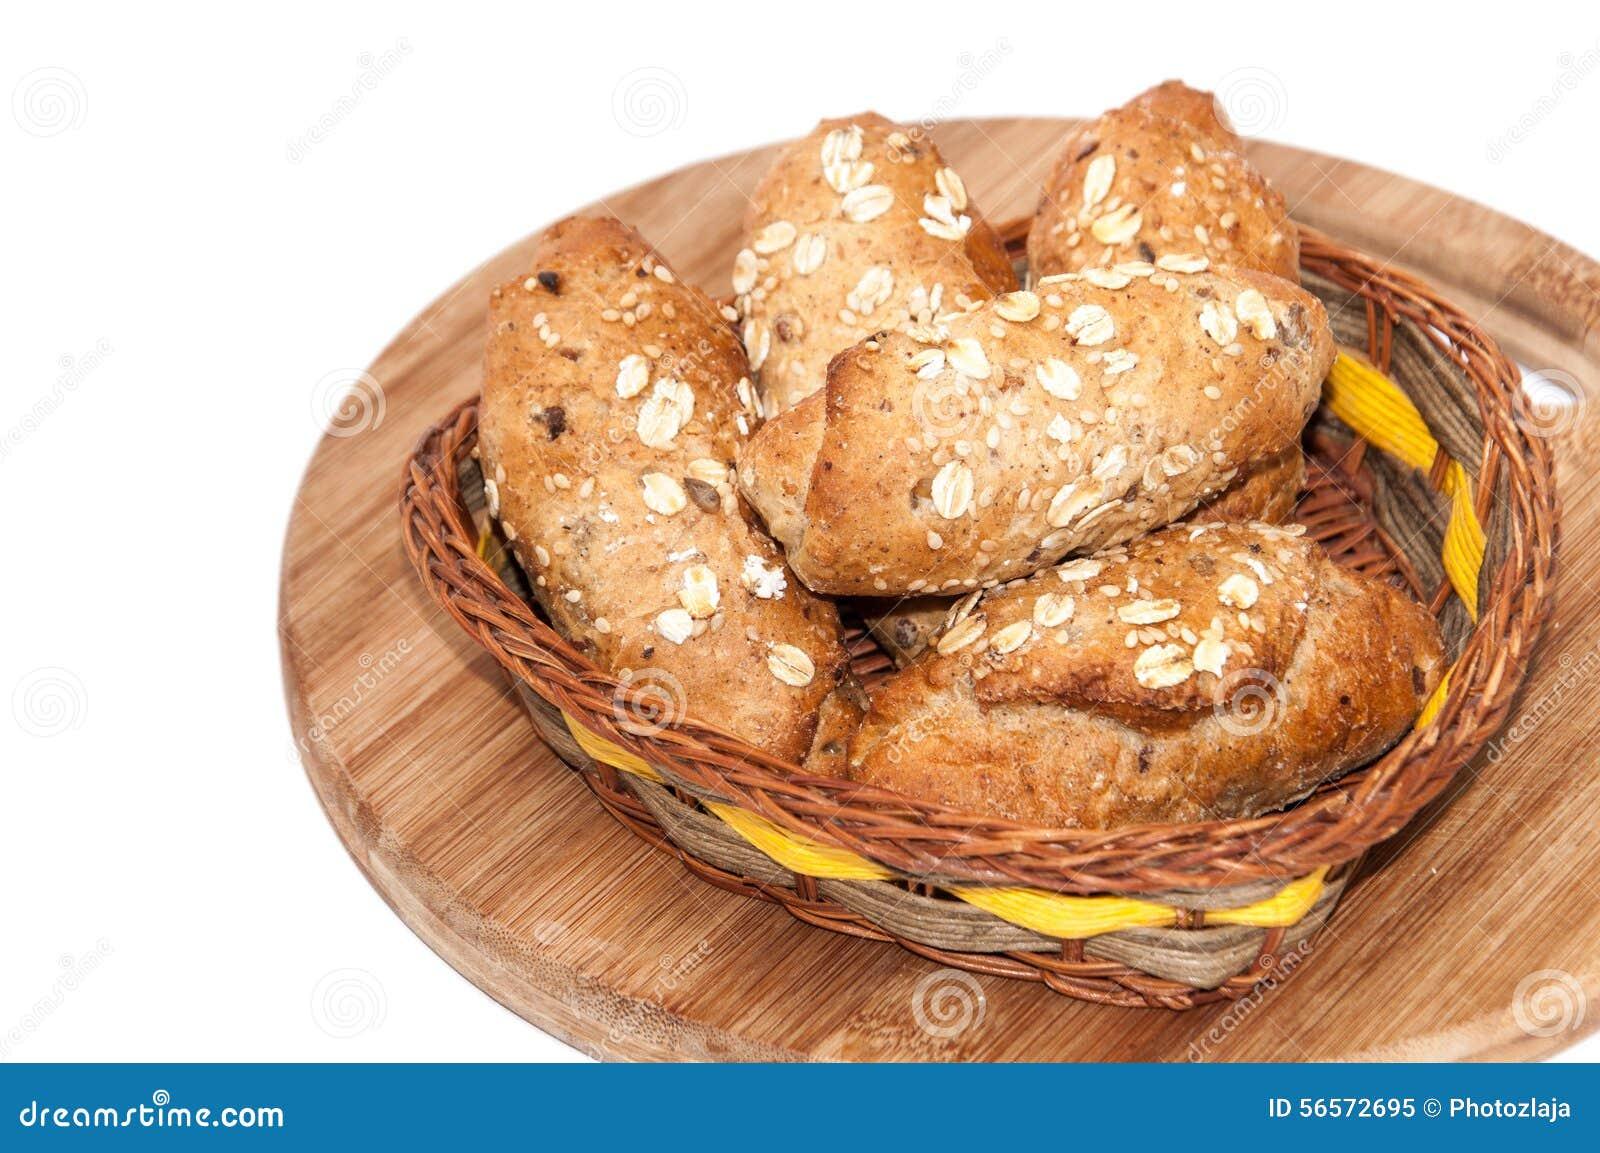 Download Υγιές τροφίμων δημητριακών ψωμί αλευριού σπόρων ακέραιο Στοκ Εικόνα - εικόνα από σκοτεινός, τρόφιμα: 56572695